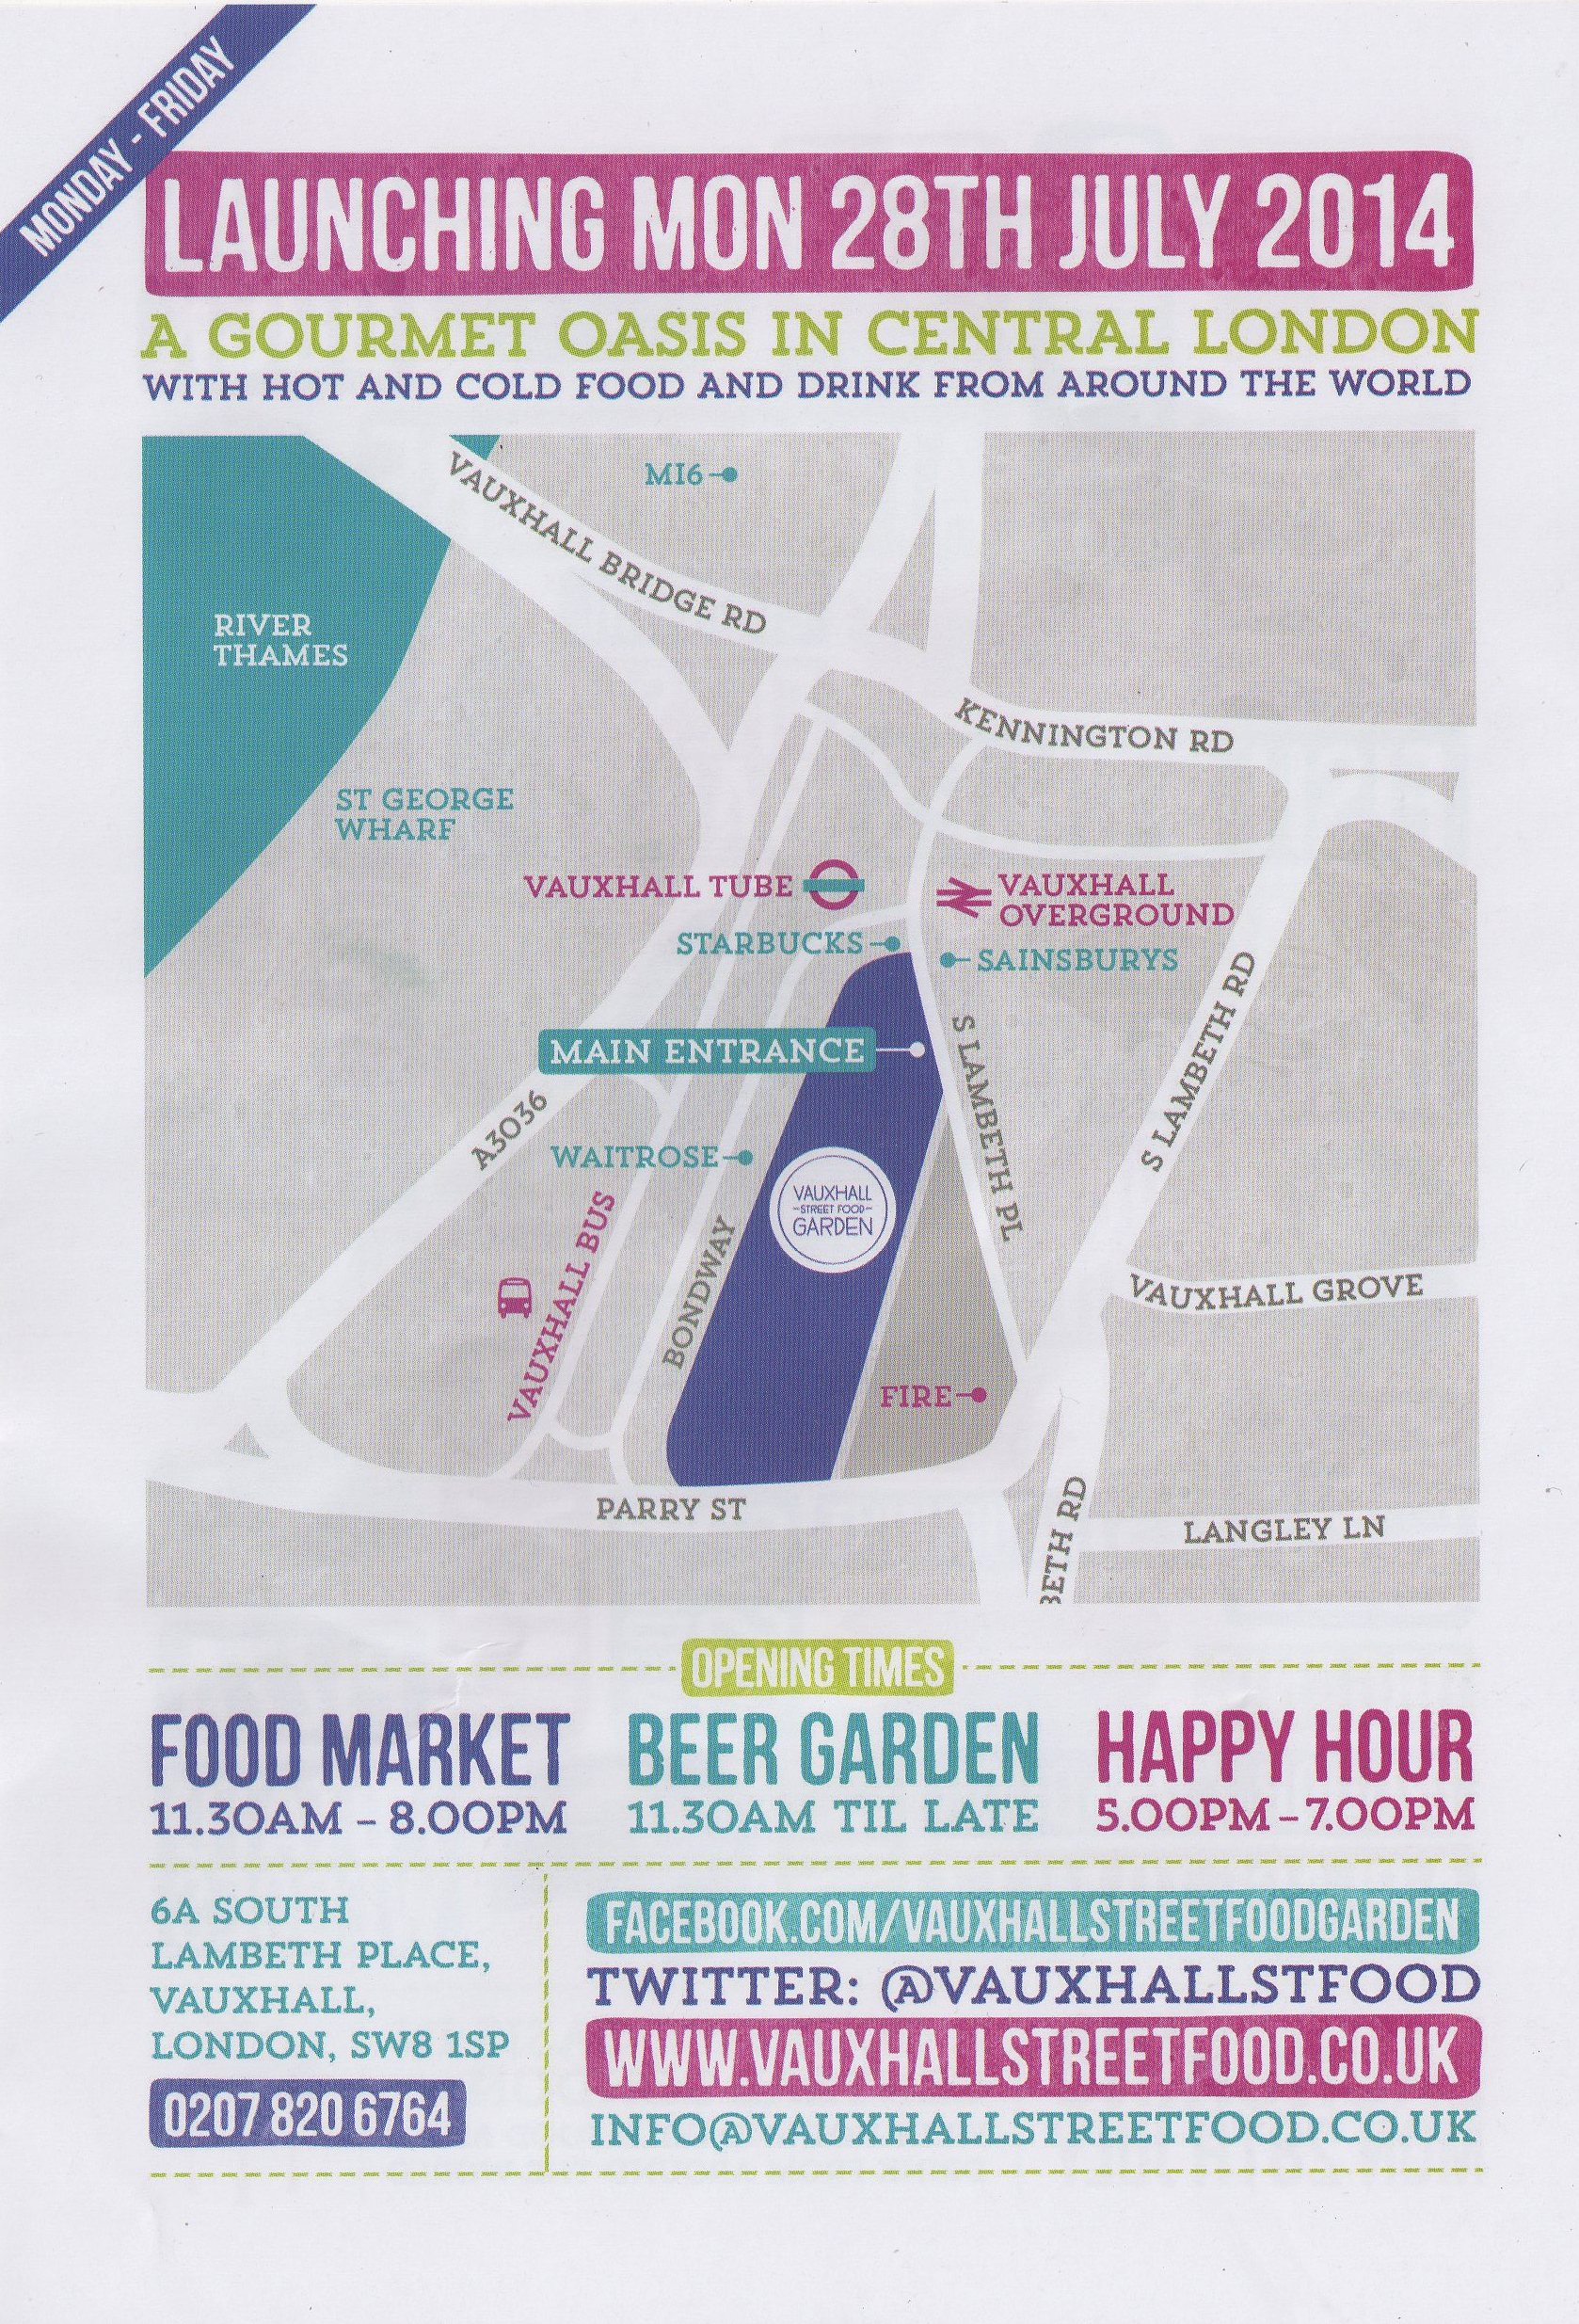 Vauxhall Street Food Market flier - info